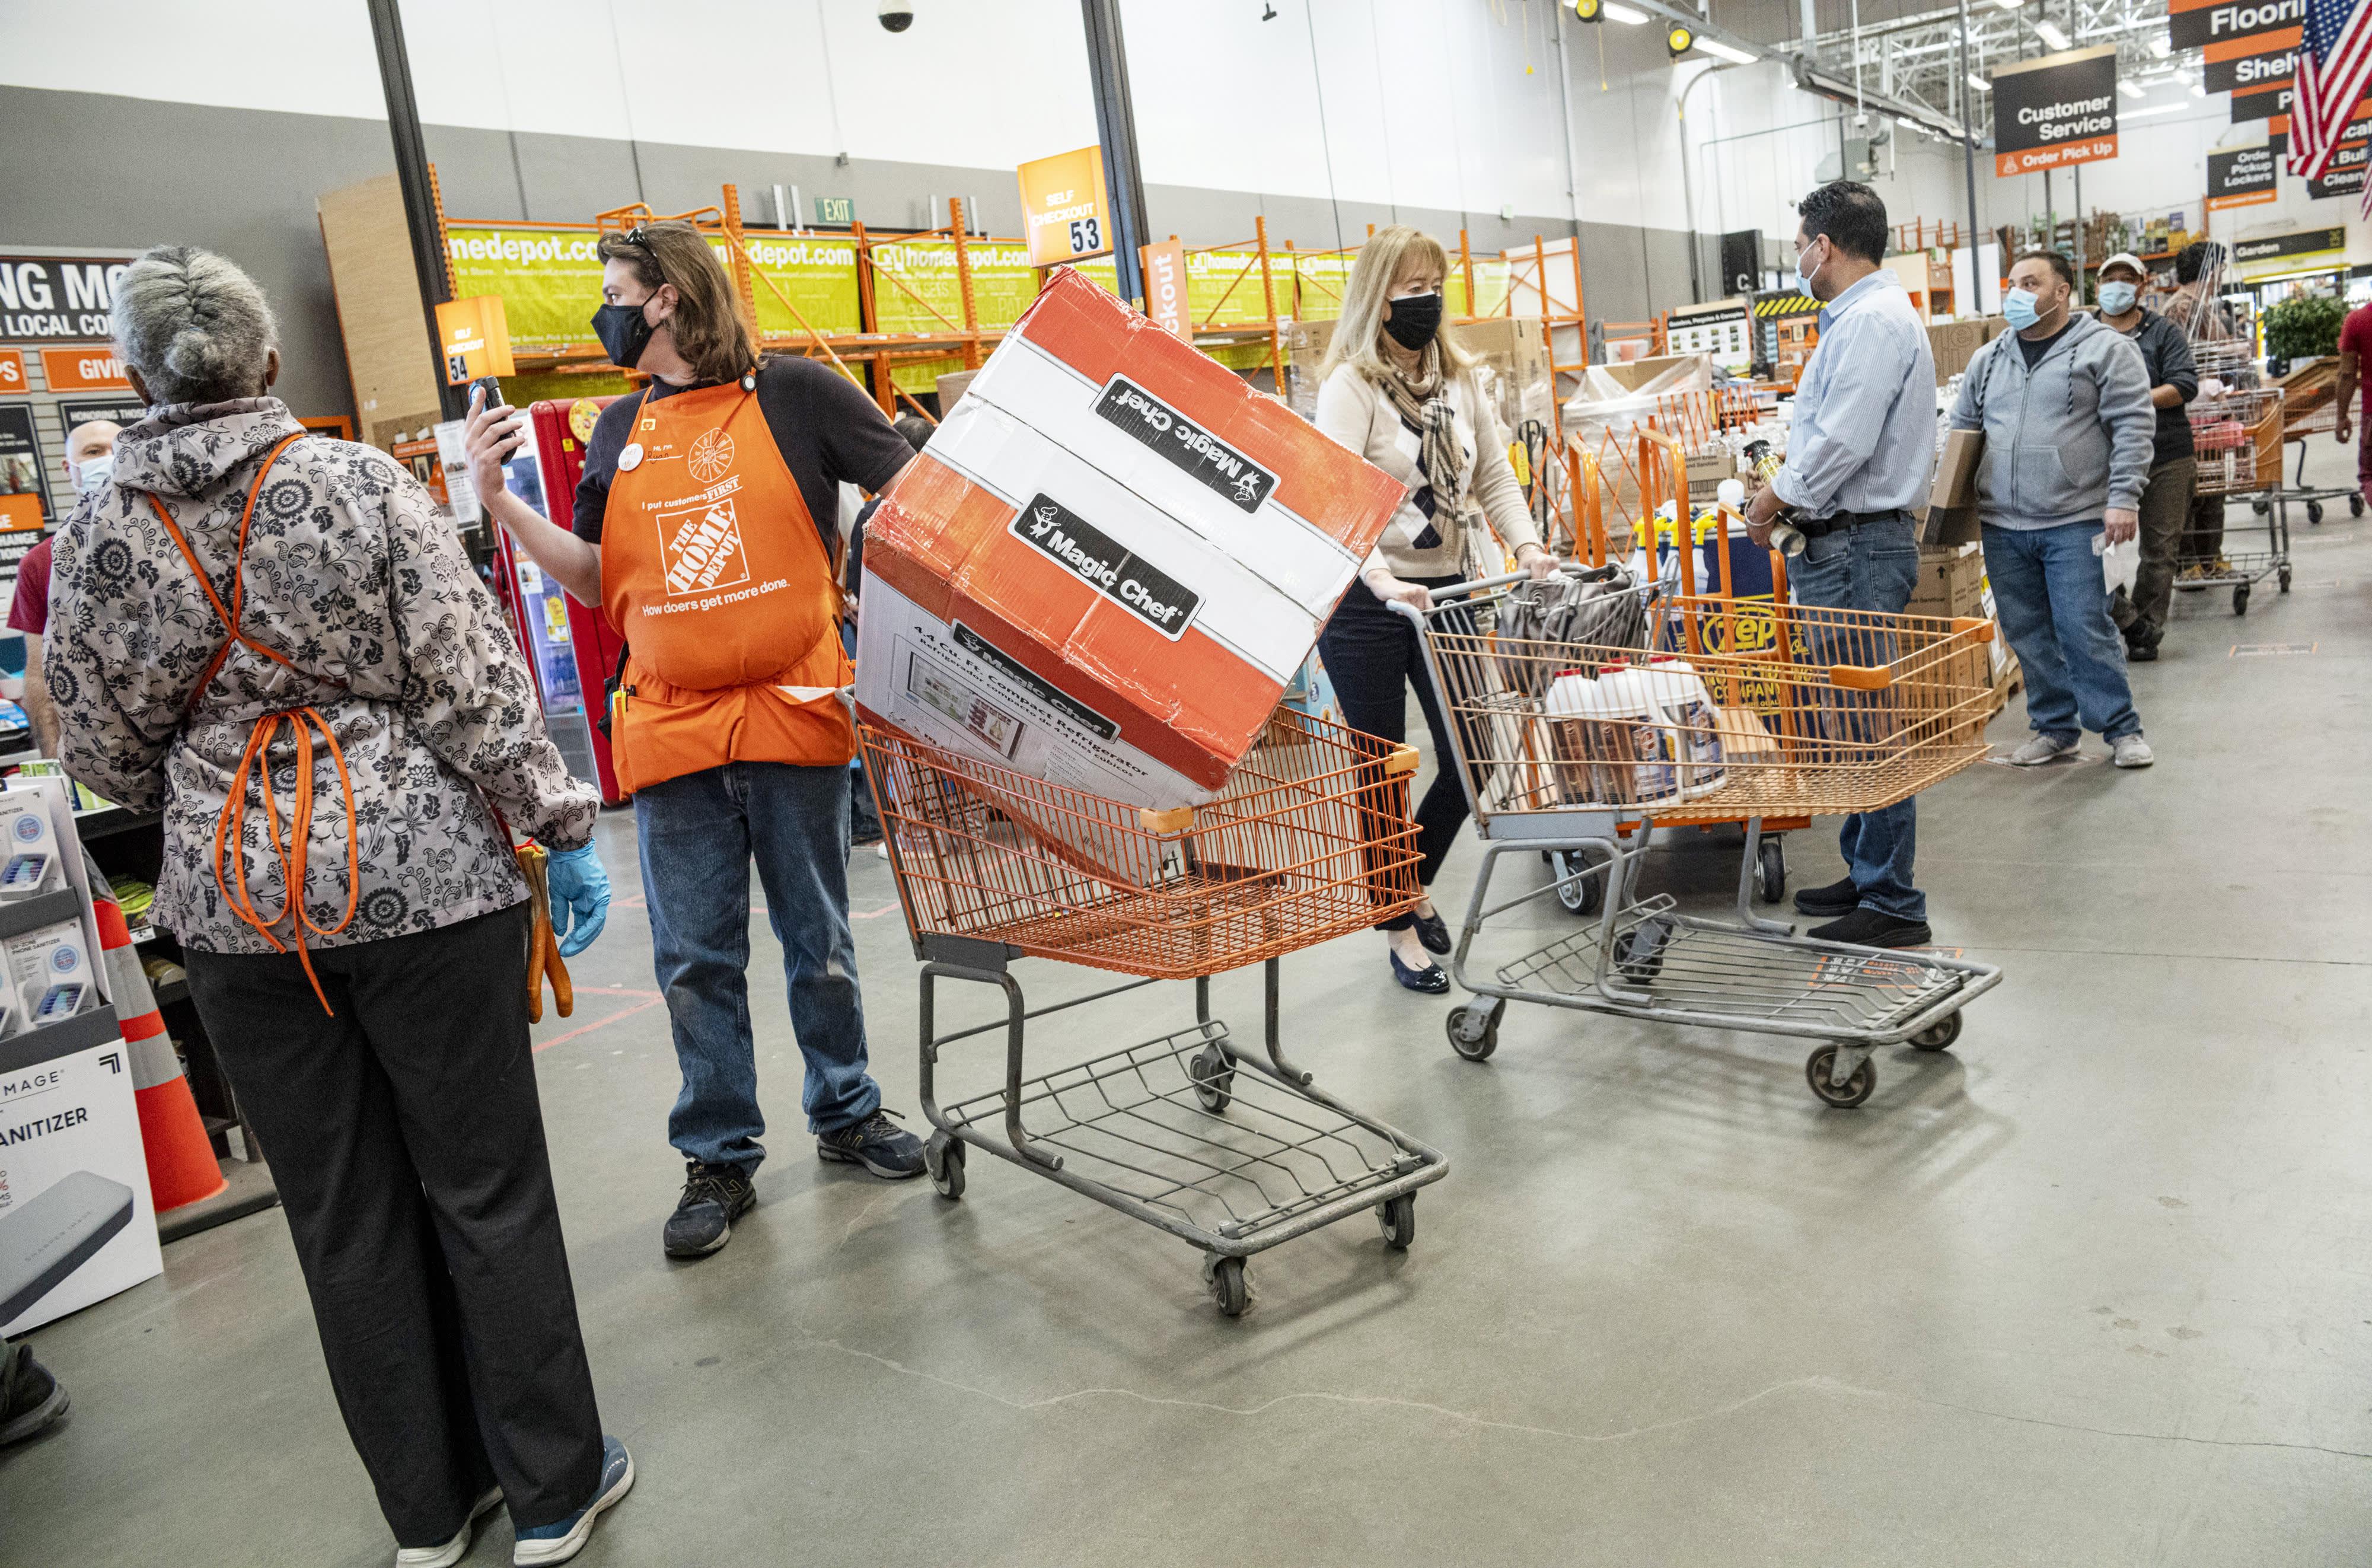 Home Depot HD Q20 20220 earnings crush estimates